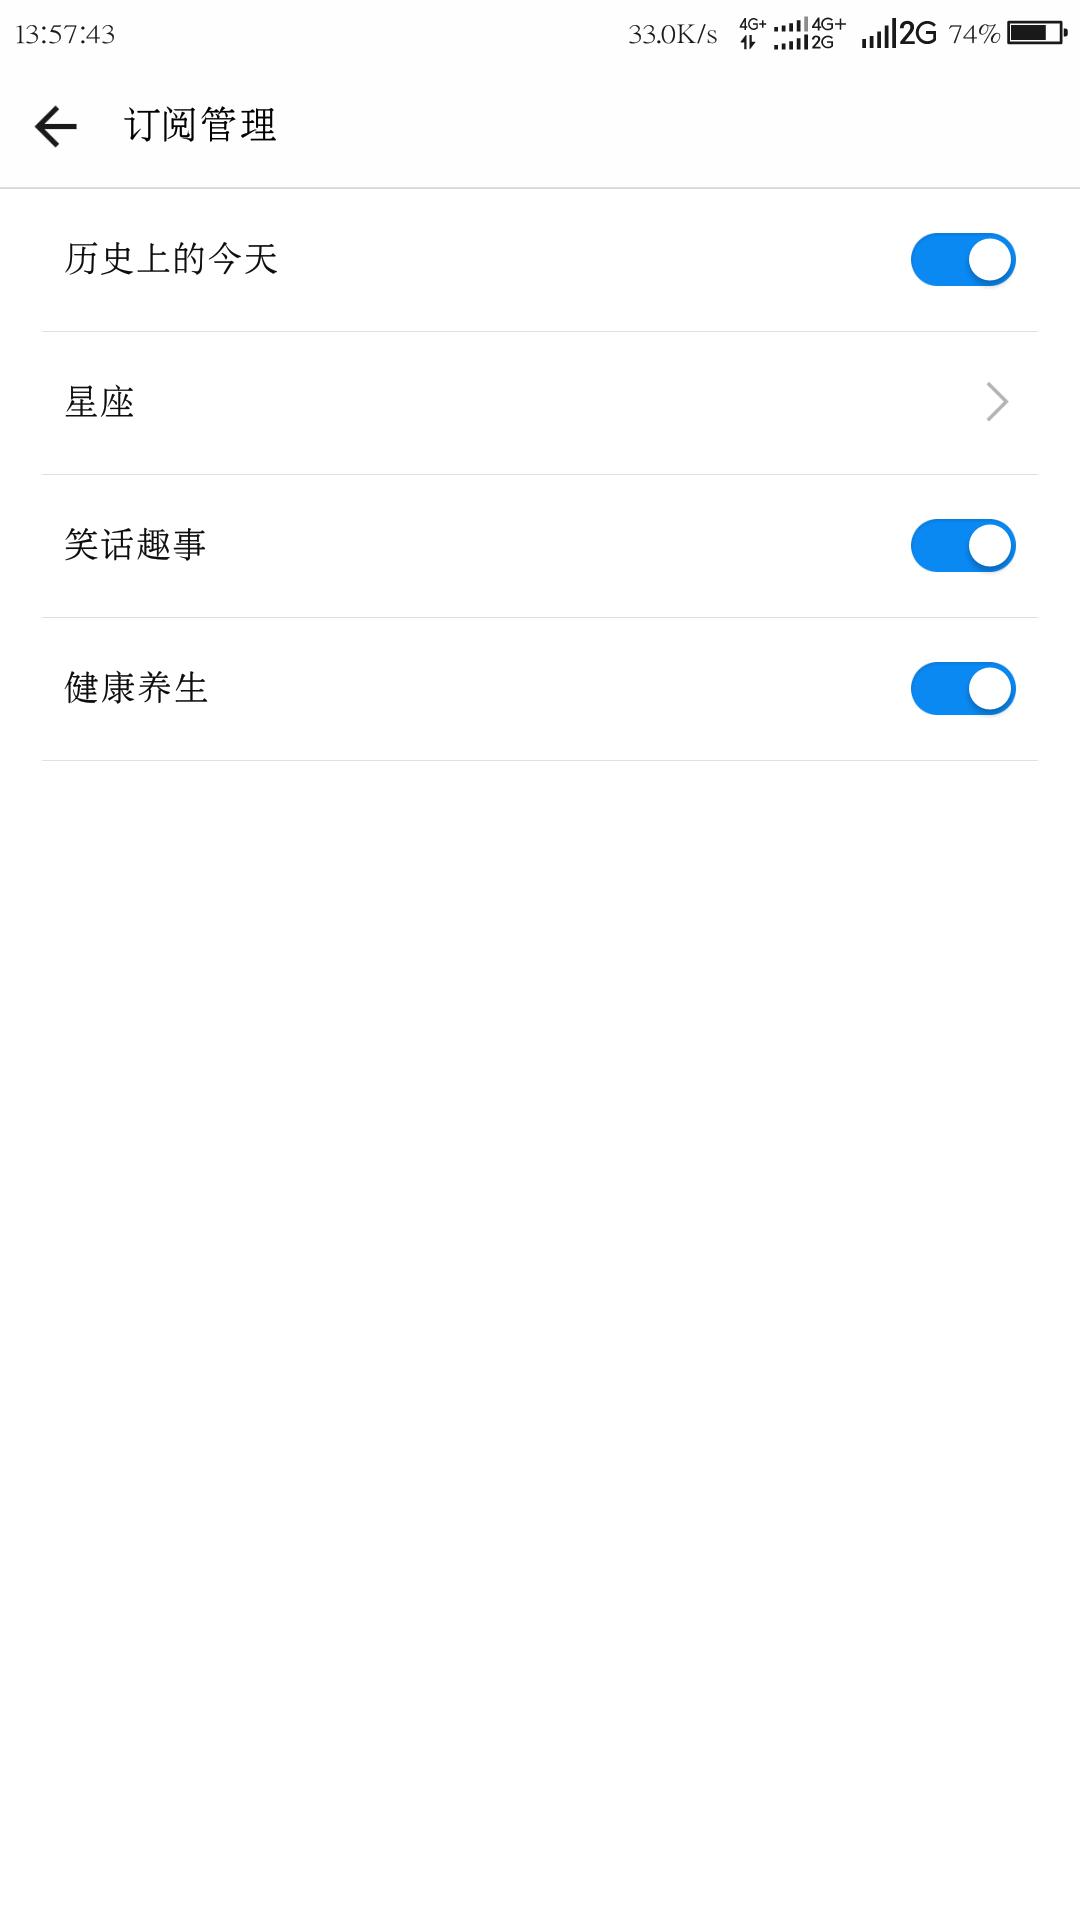 Screenshot_2018-03-01-13-57-45.png